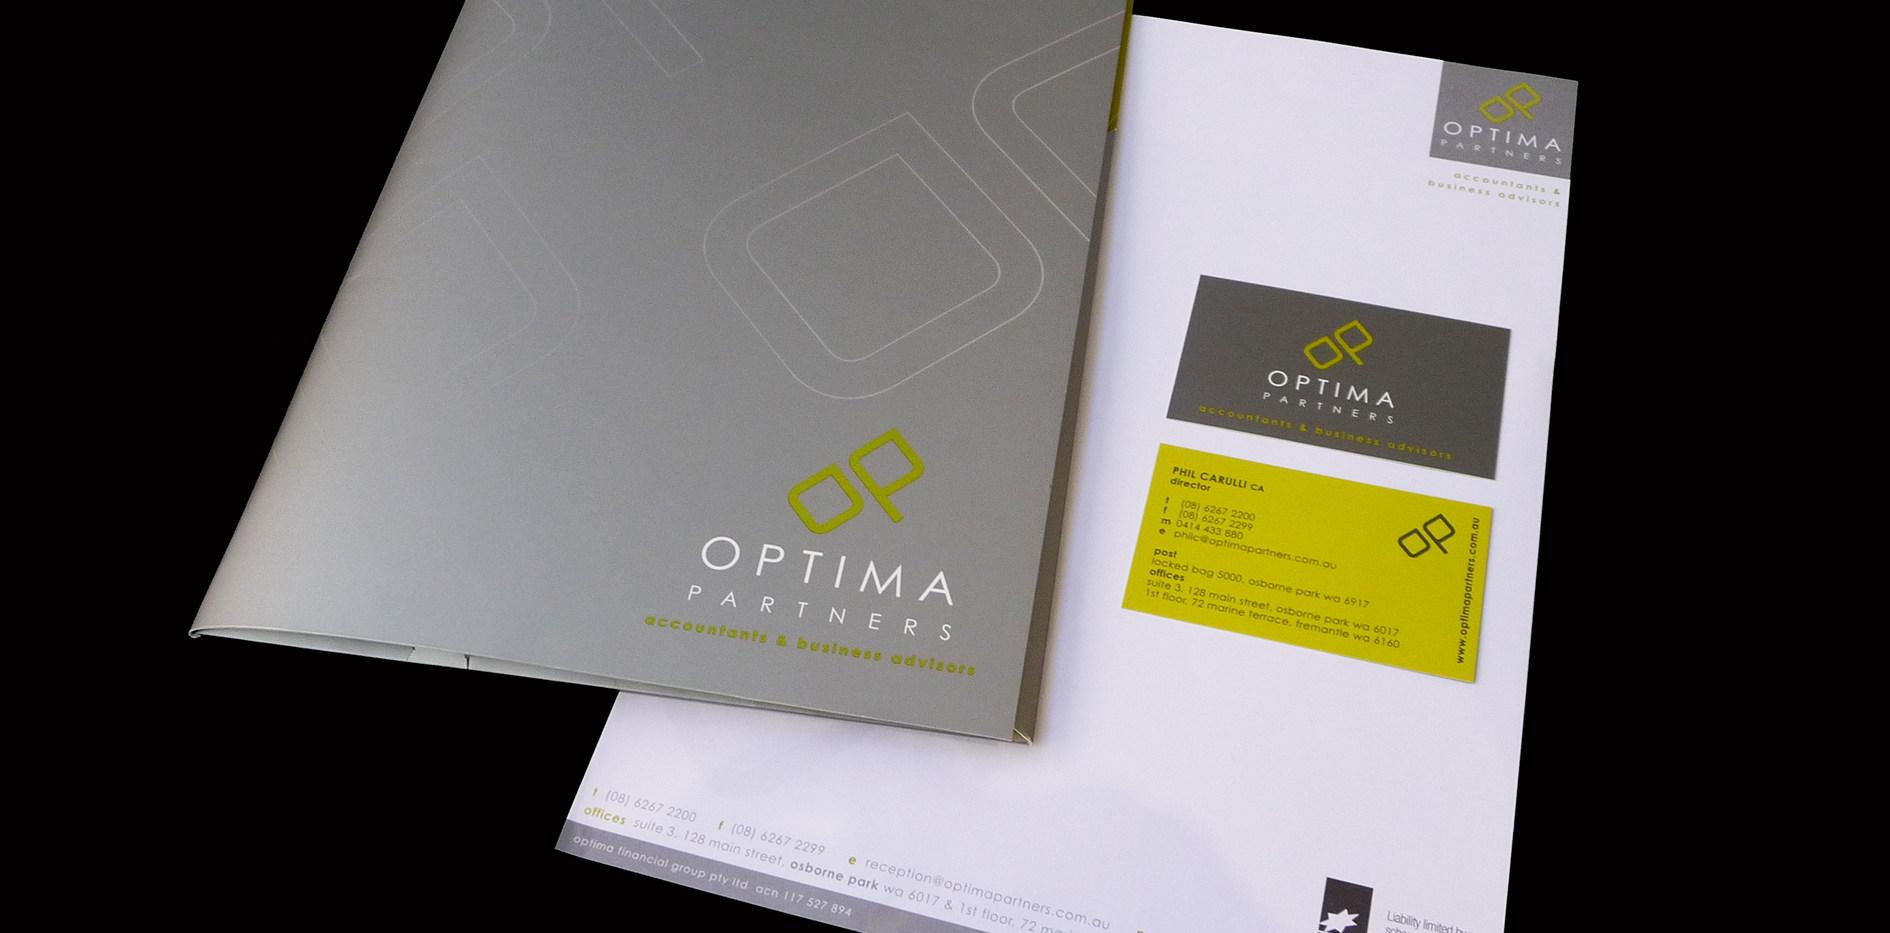 Optima-stationery.jpg